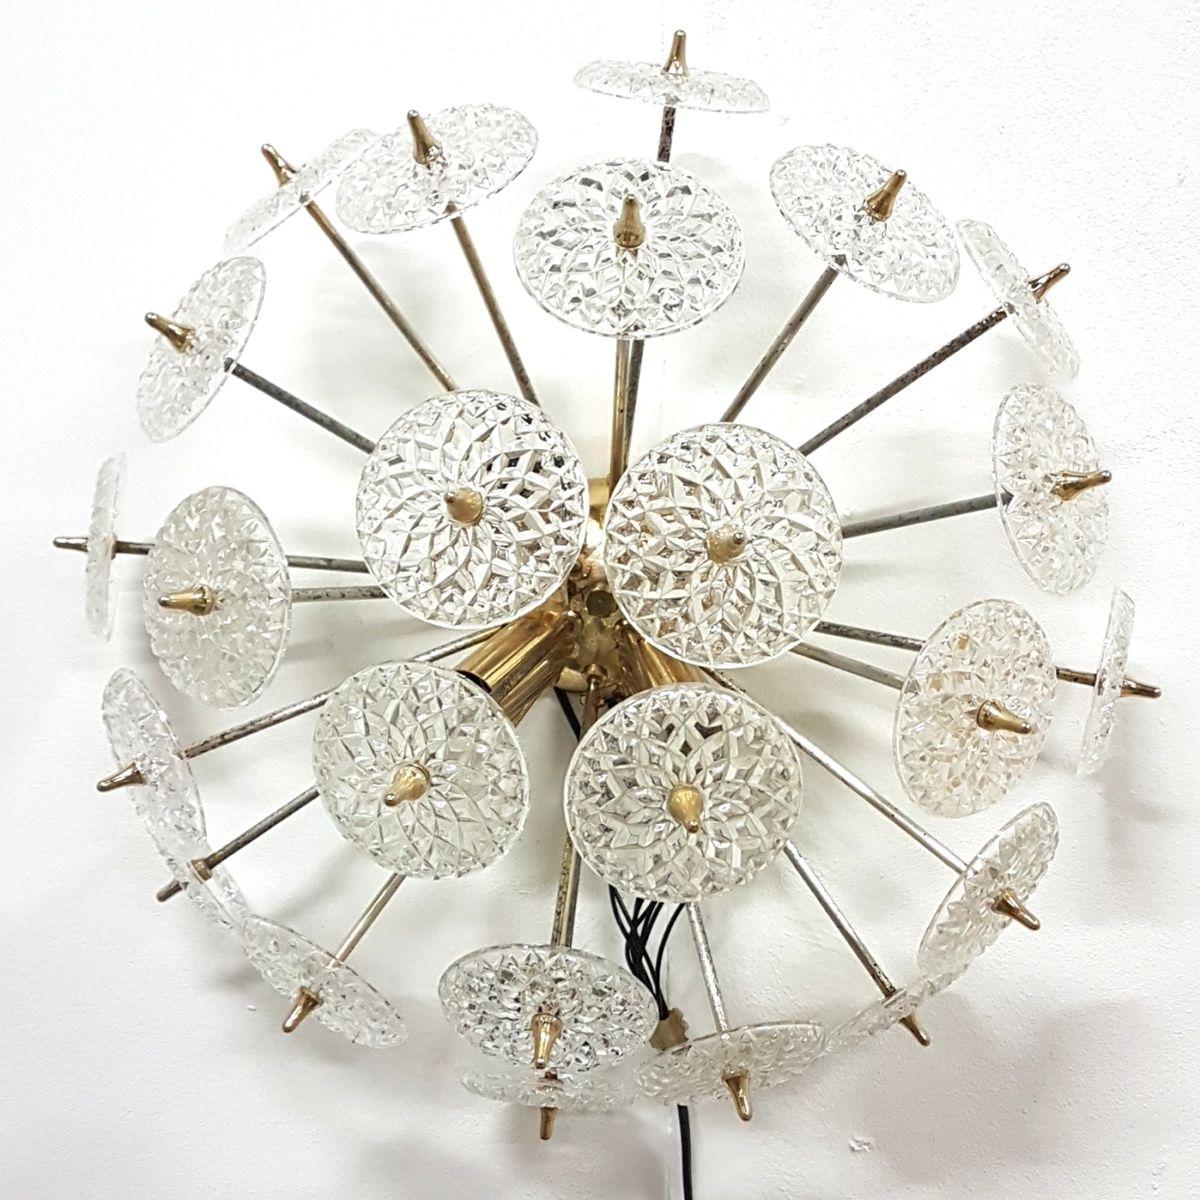 Belgische Vintage Sputnik Wandlampe von Massive Lighting, 1970er